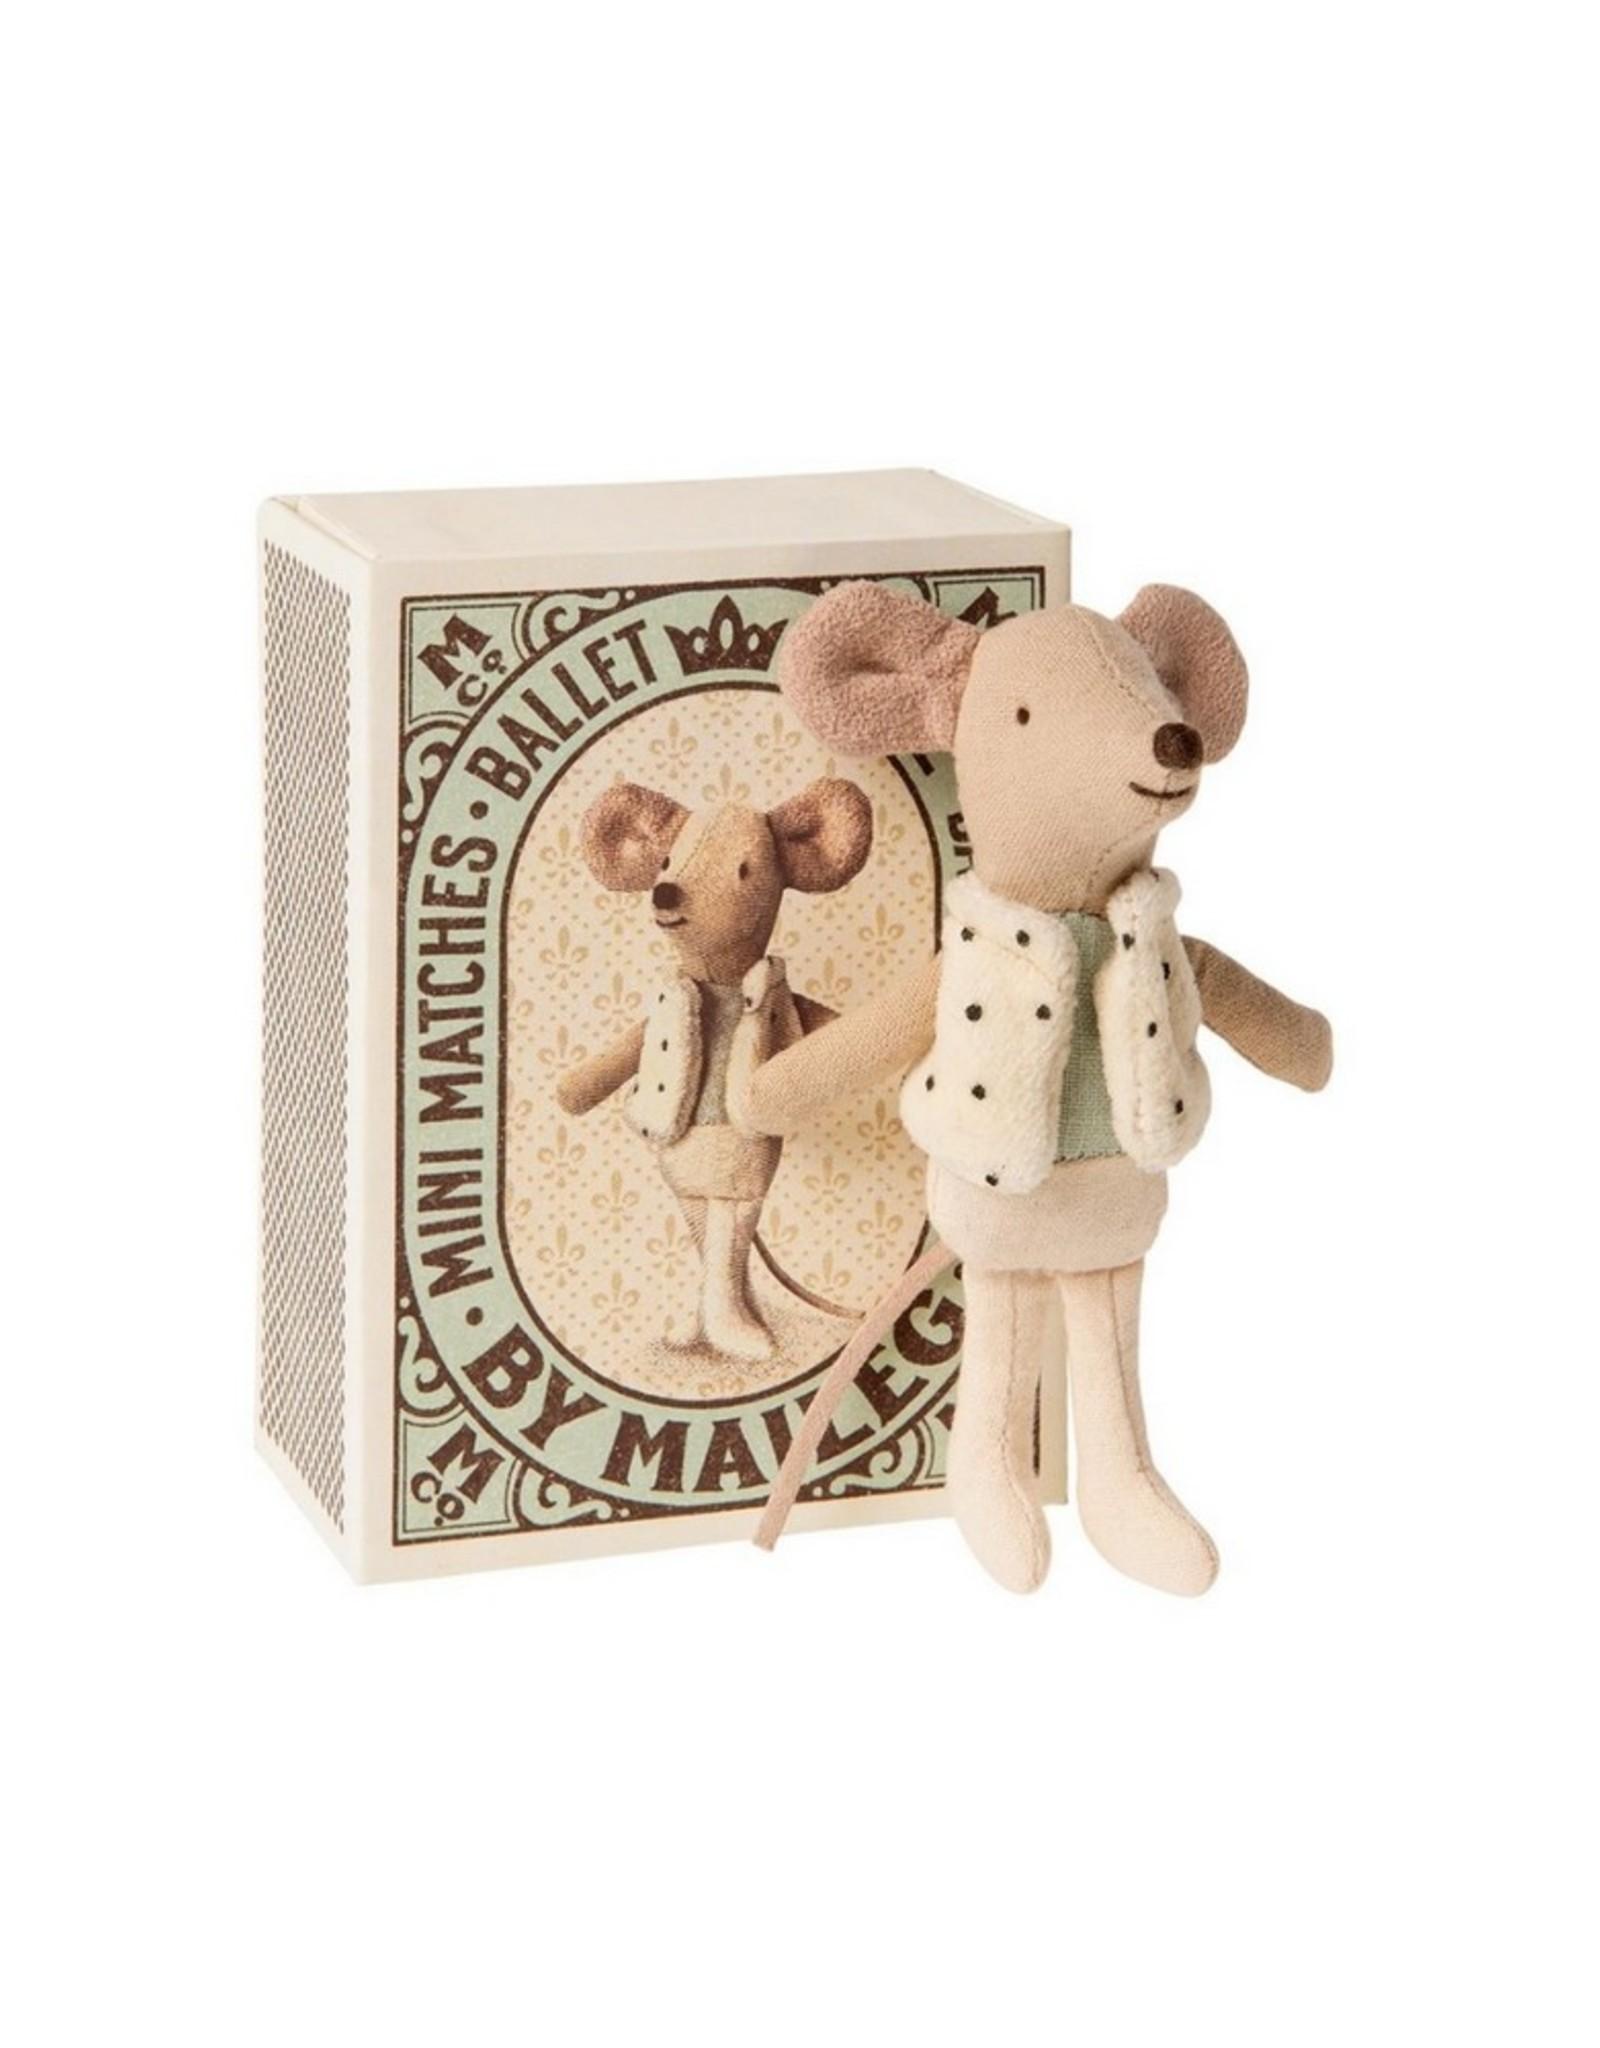 Maileg Knuffel Dancer Mouse in matchbox